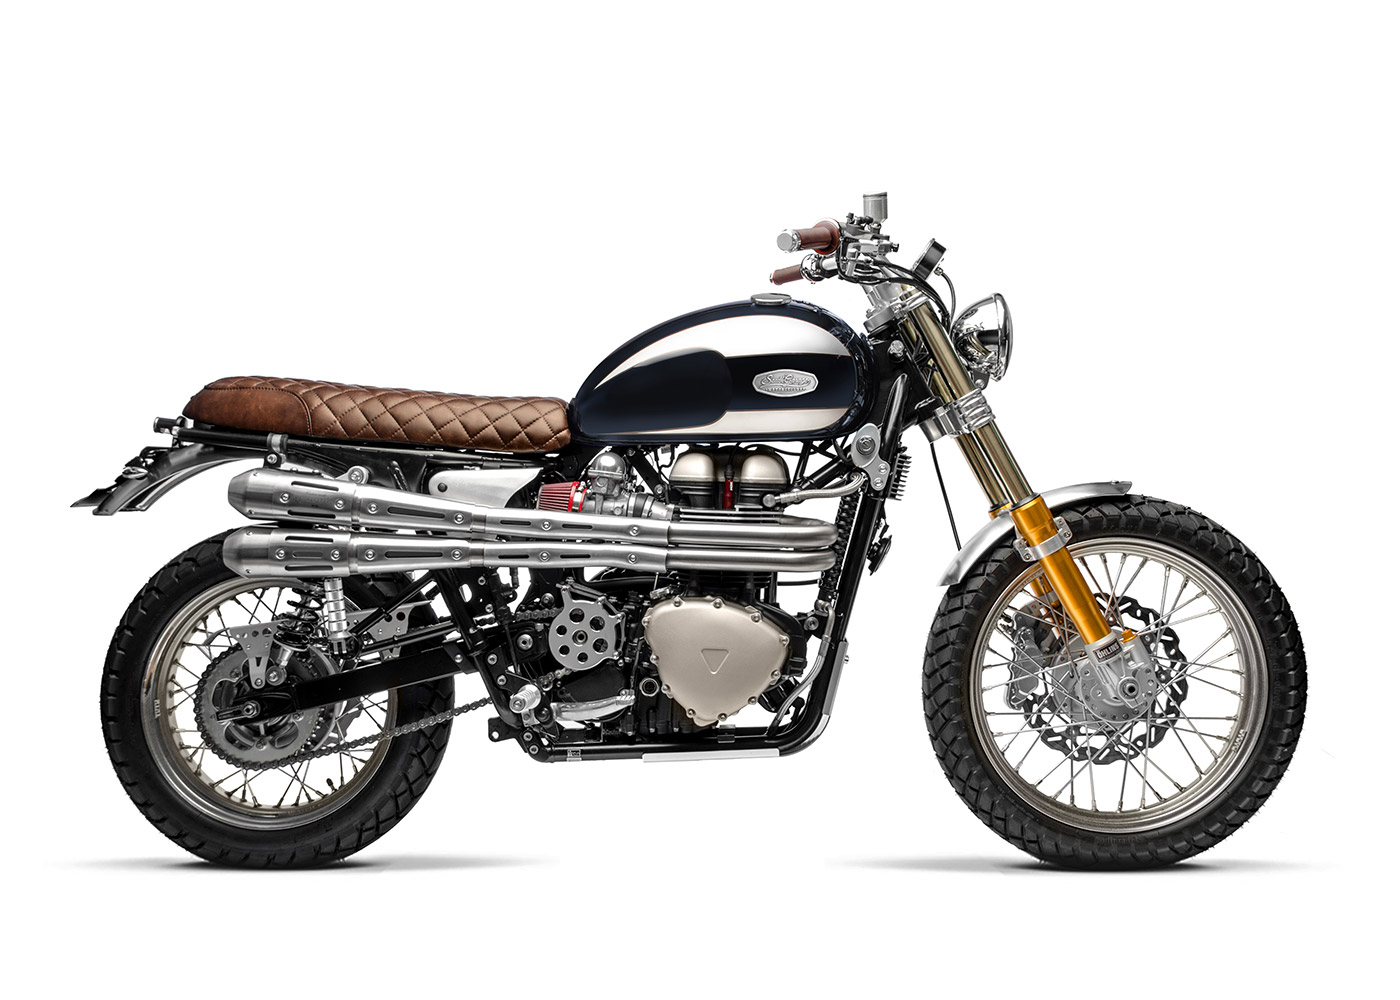 Scarico GTR8802 per moto triumph Bonneville T100 (05-15) | SPARK